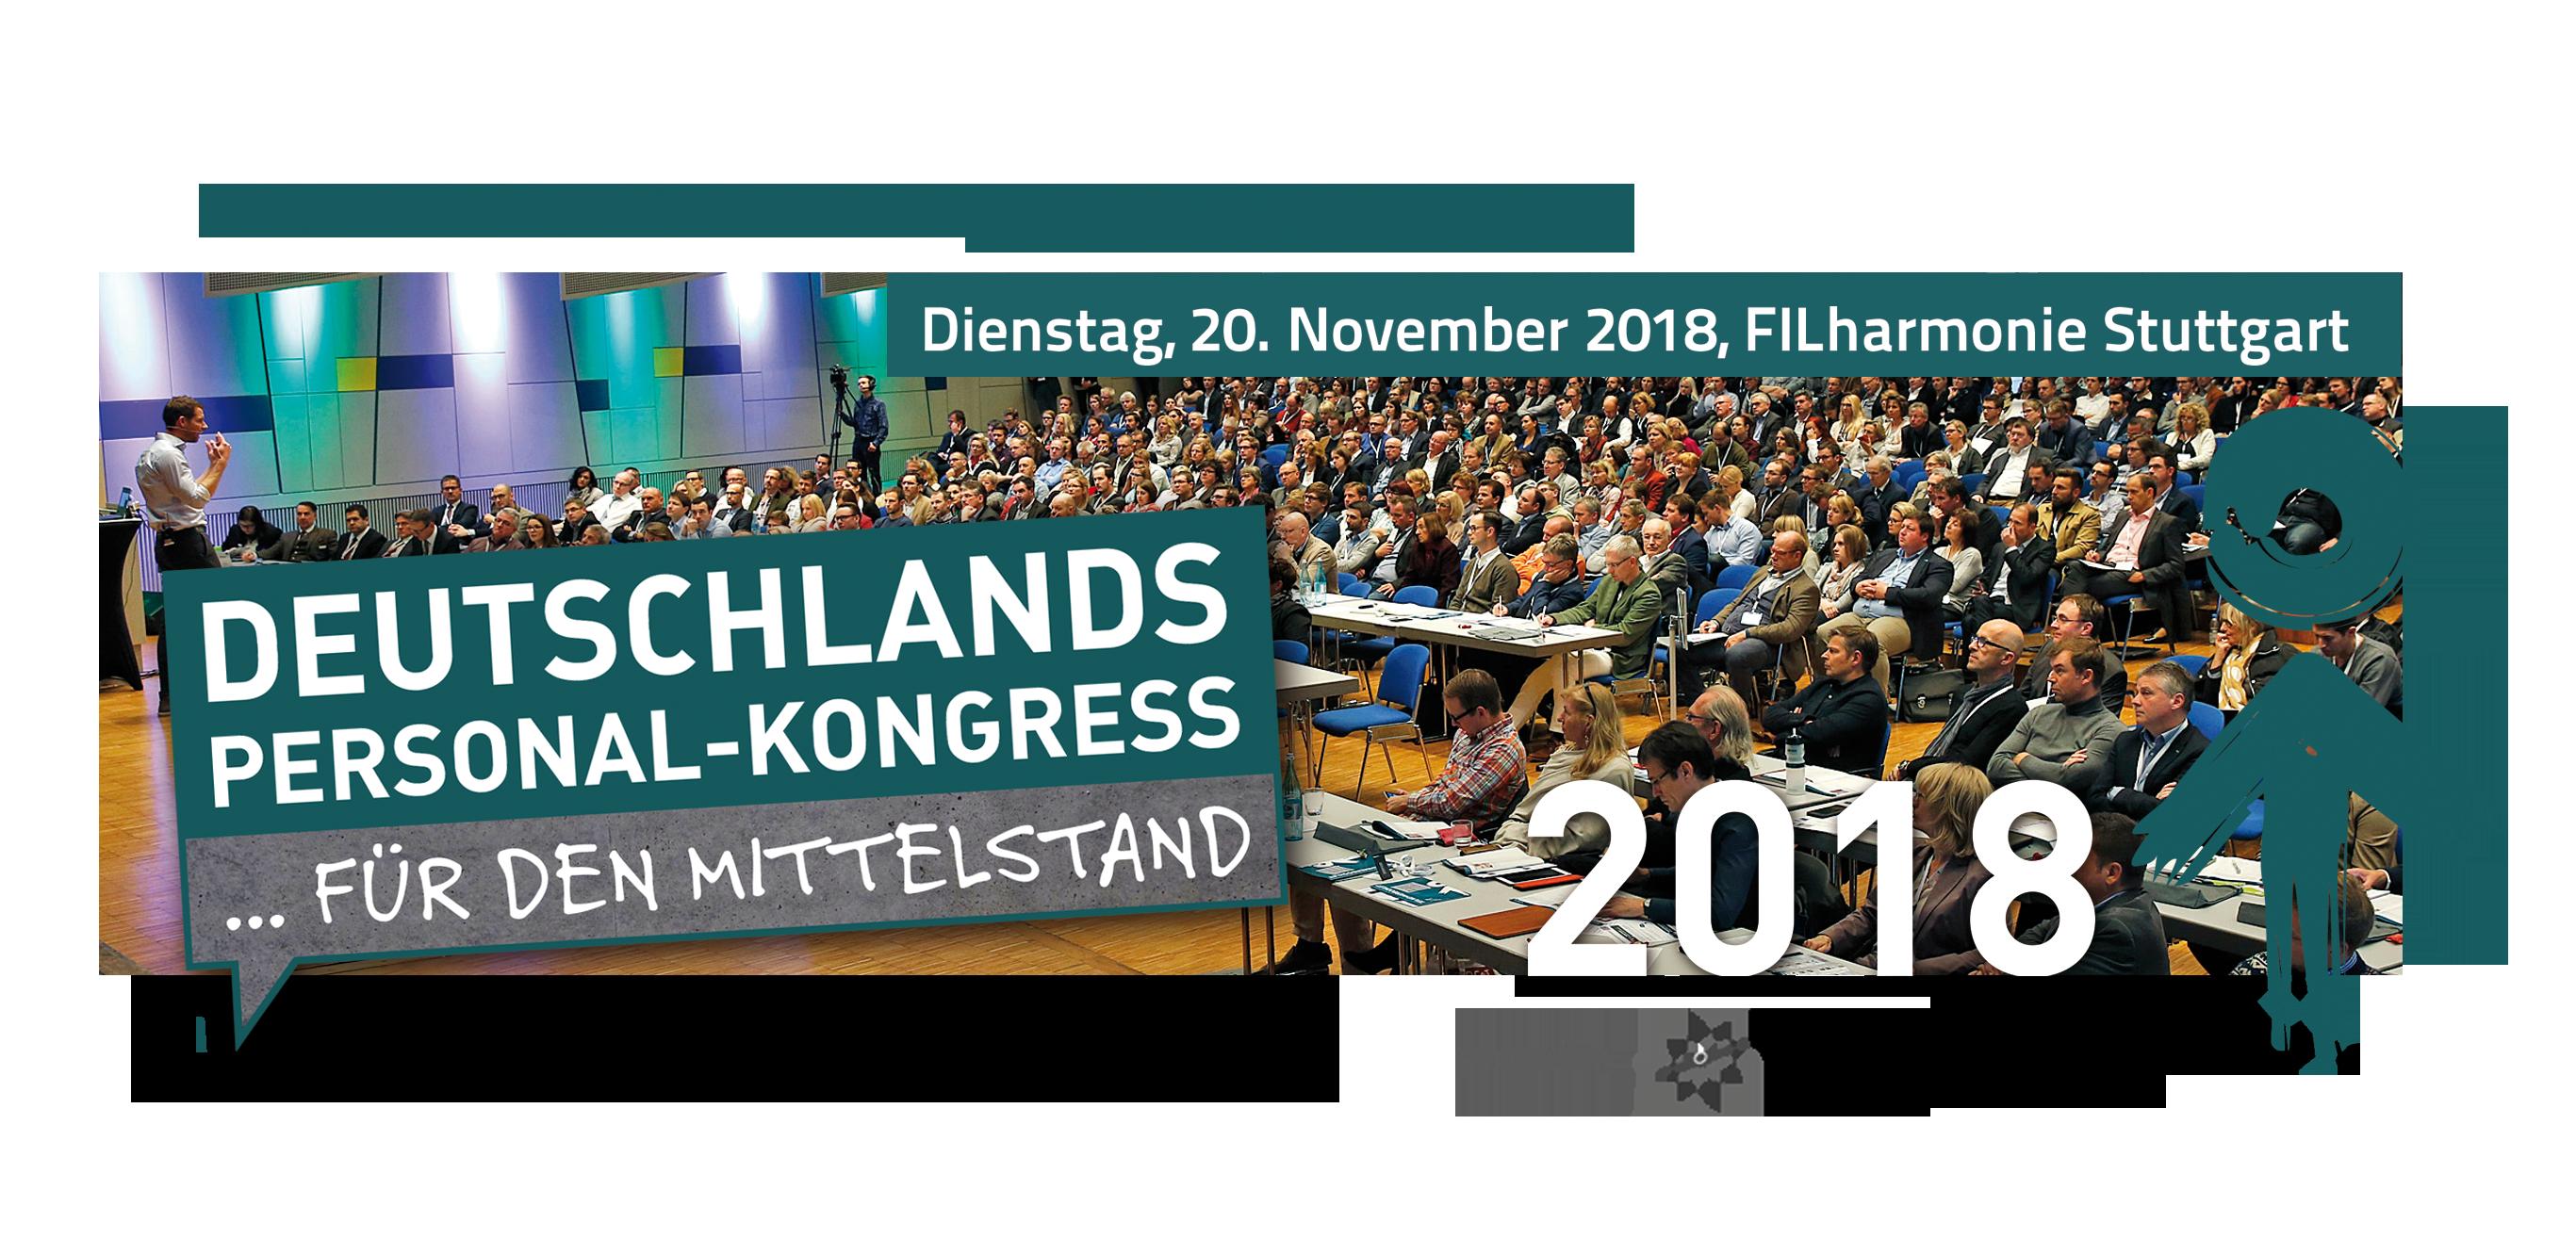 2018-deutschlands-personal-kongress-mittelstand